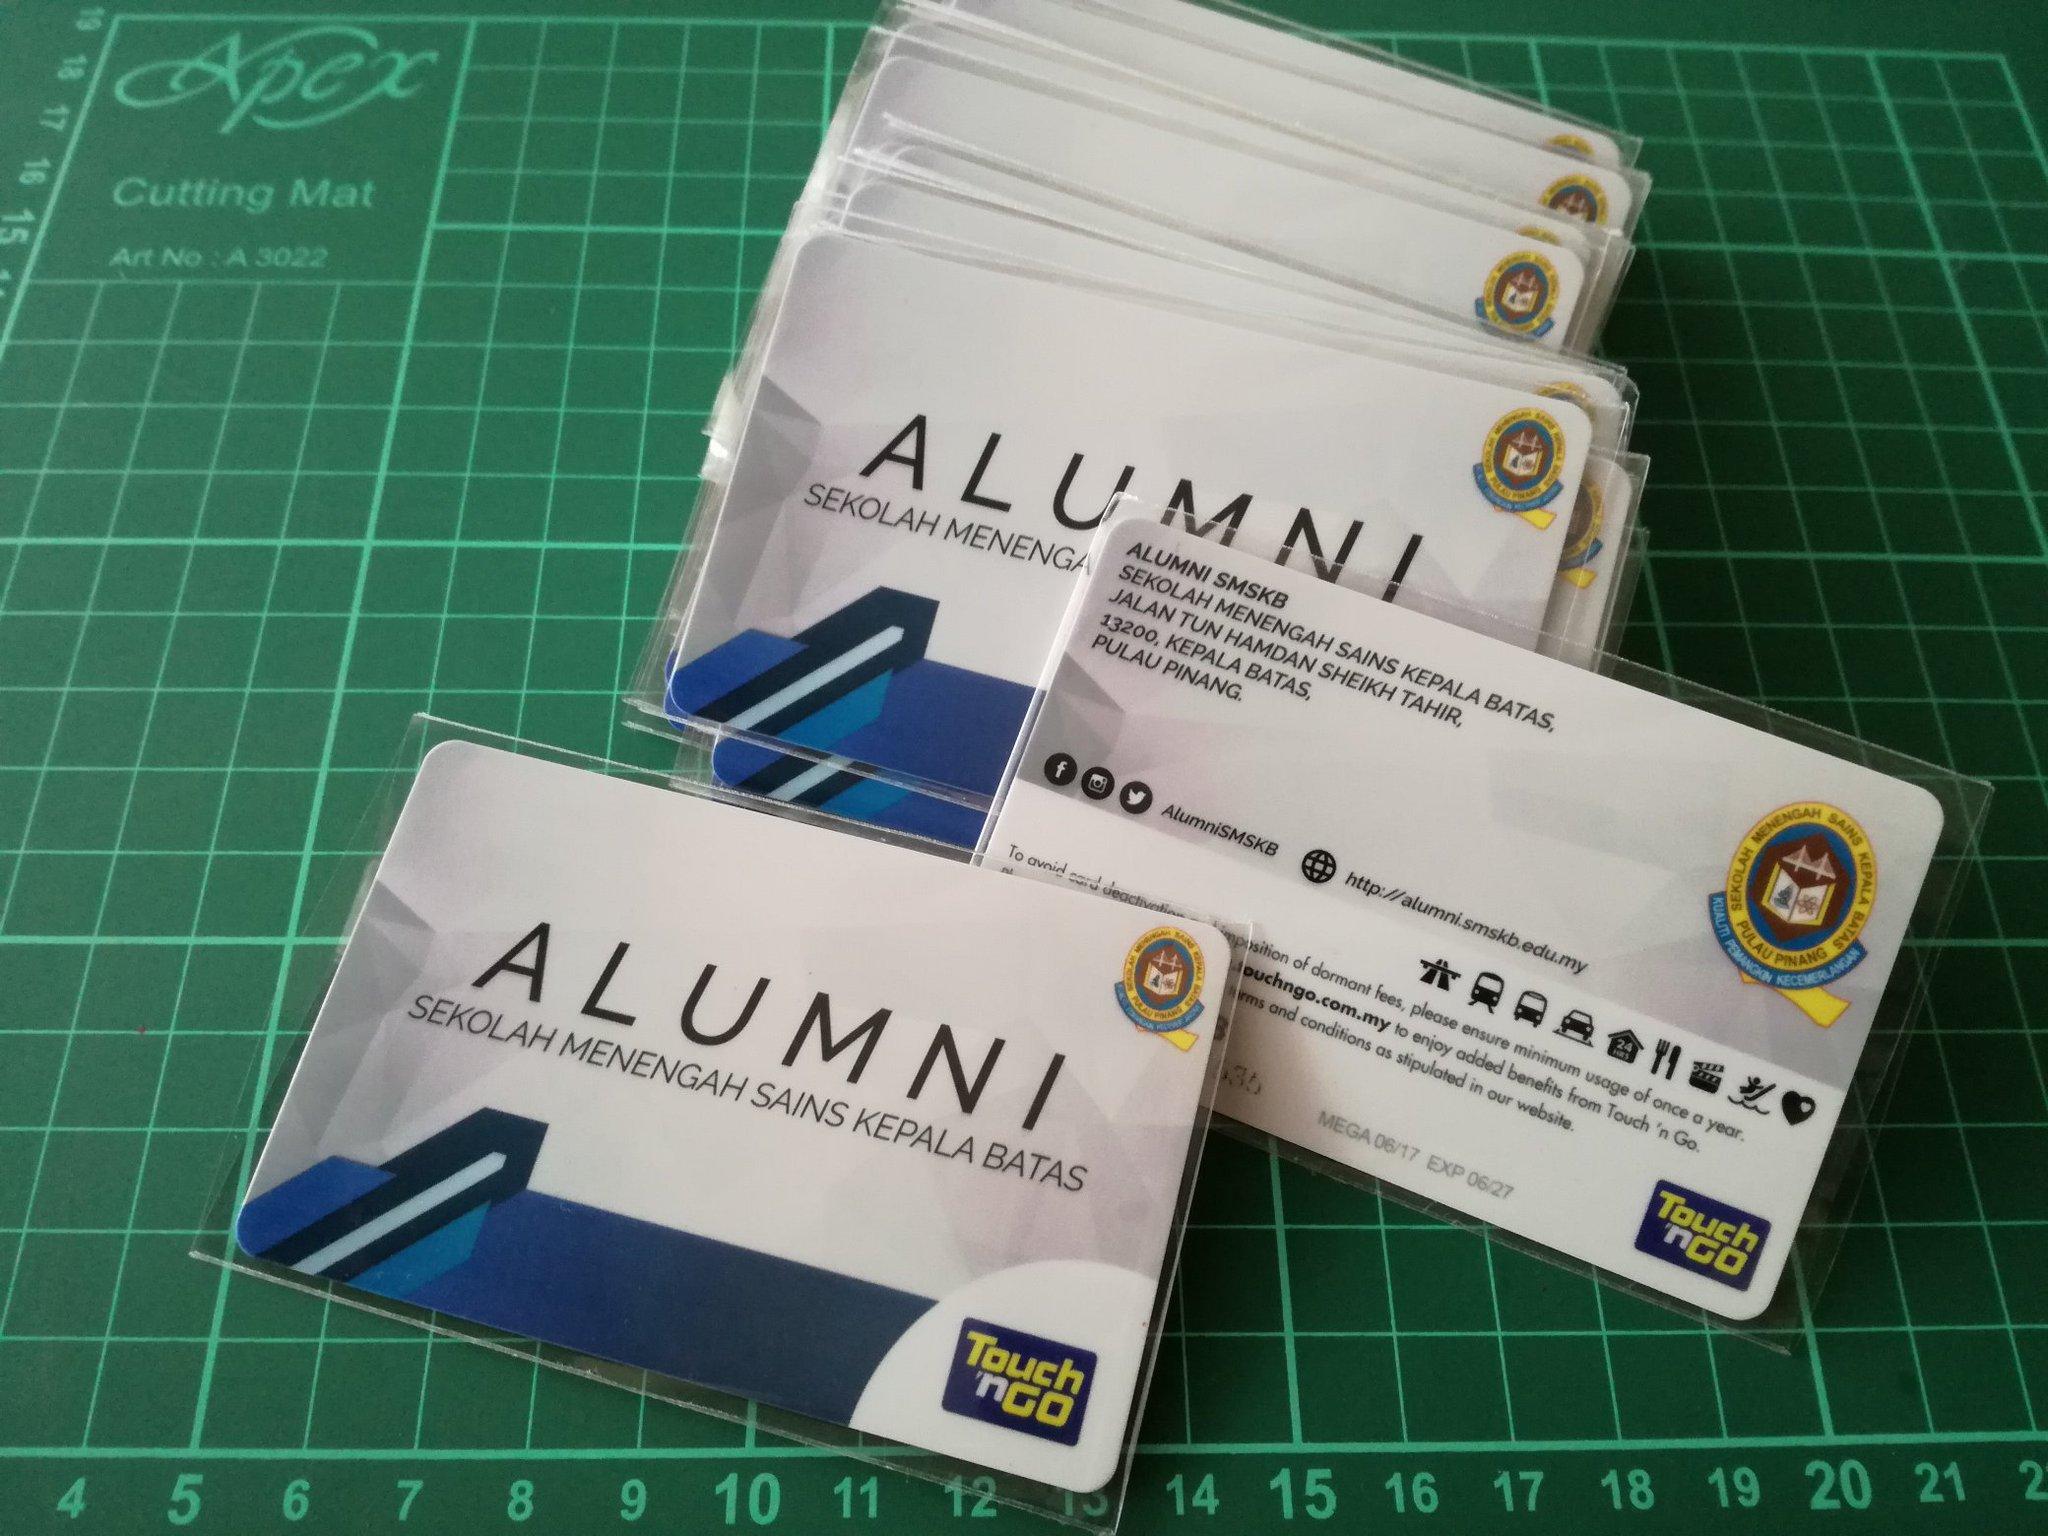 Alumni Smskb Di Twitter Kad Touch N Go Alumni Smskb Dah Siap Akan Pos Lepas Raya